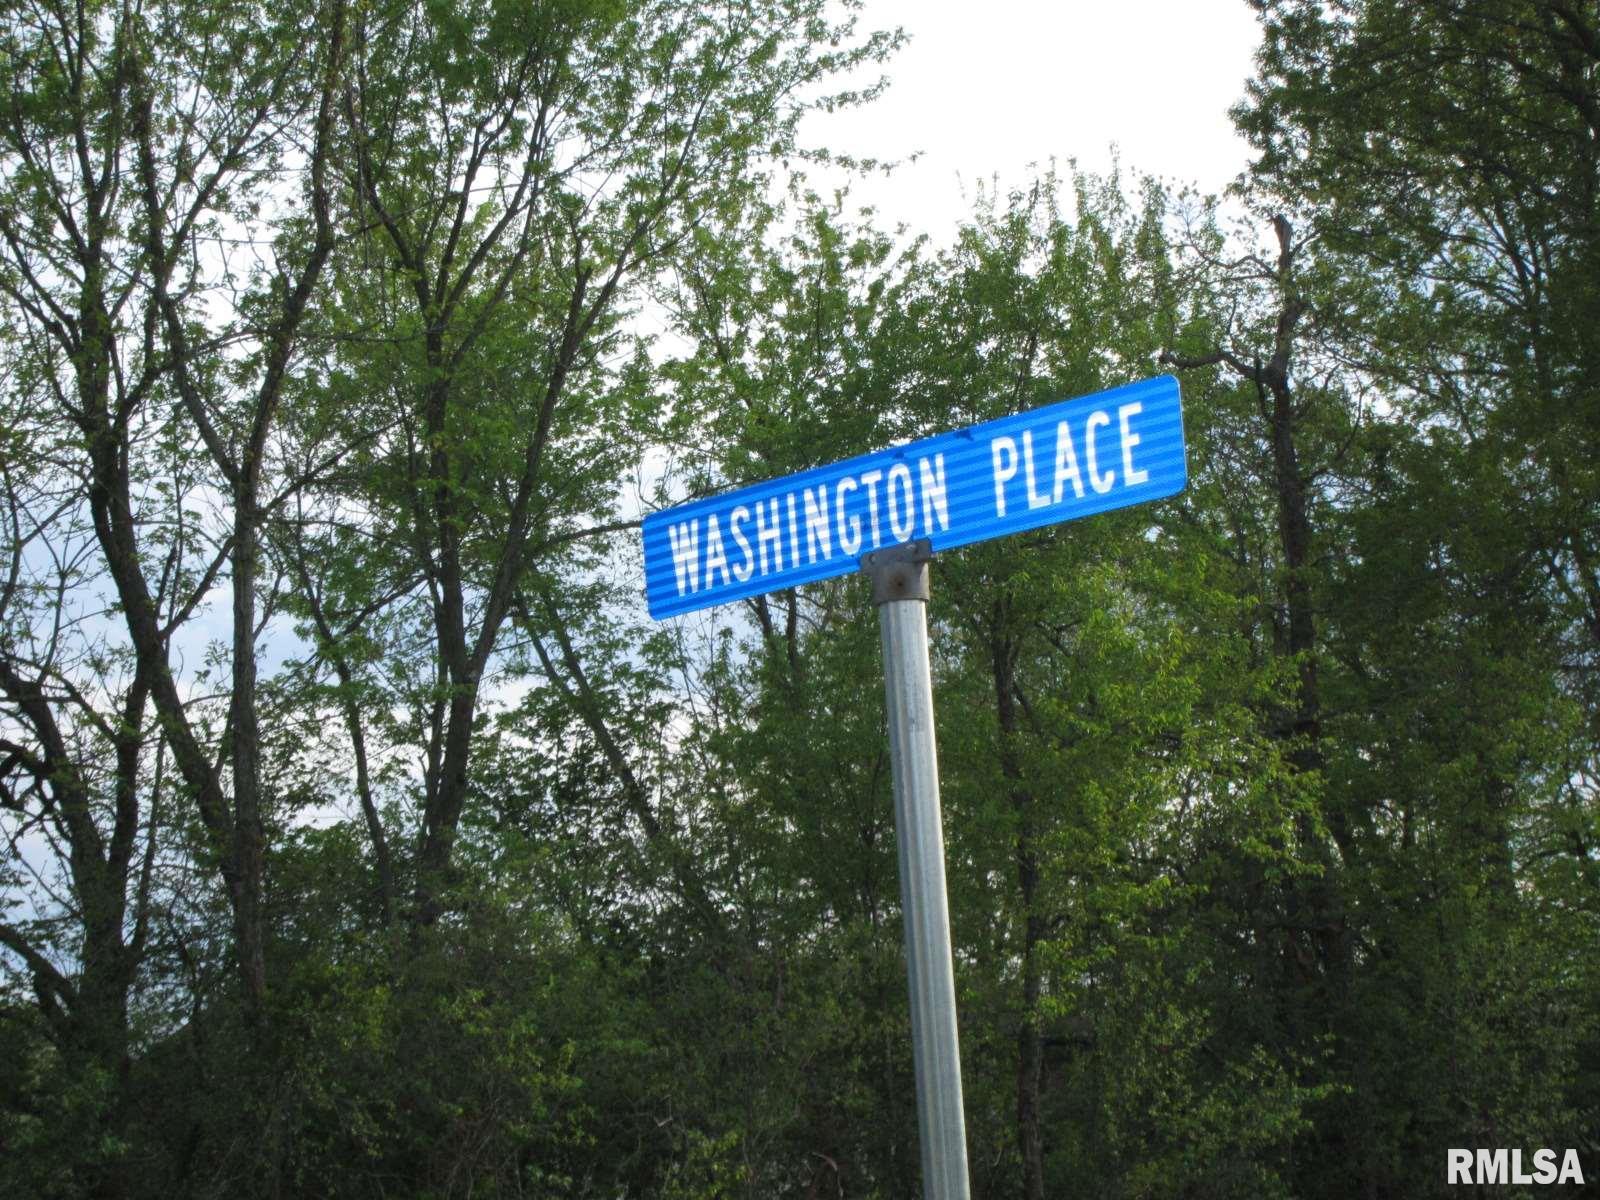 212 WASHINGTON Property Photo - Riverton, IL real estate listing